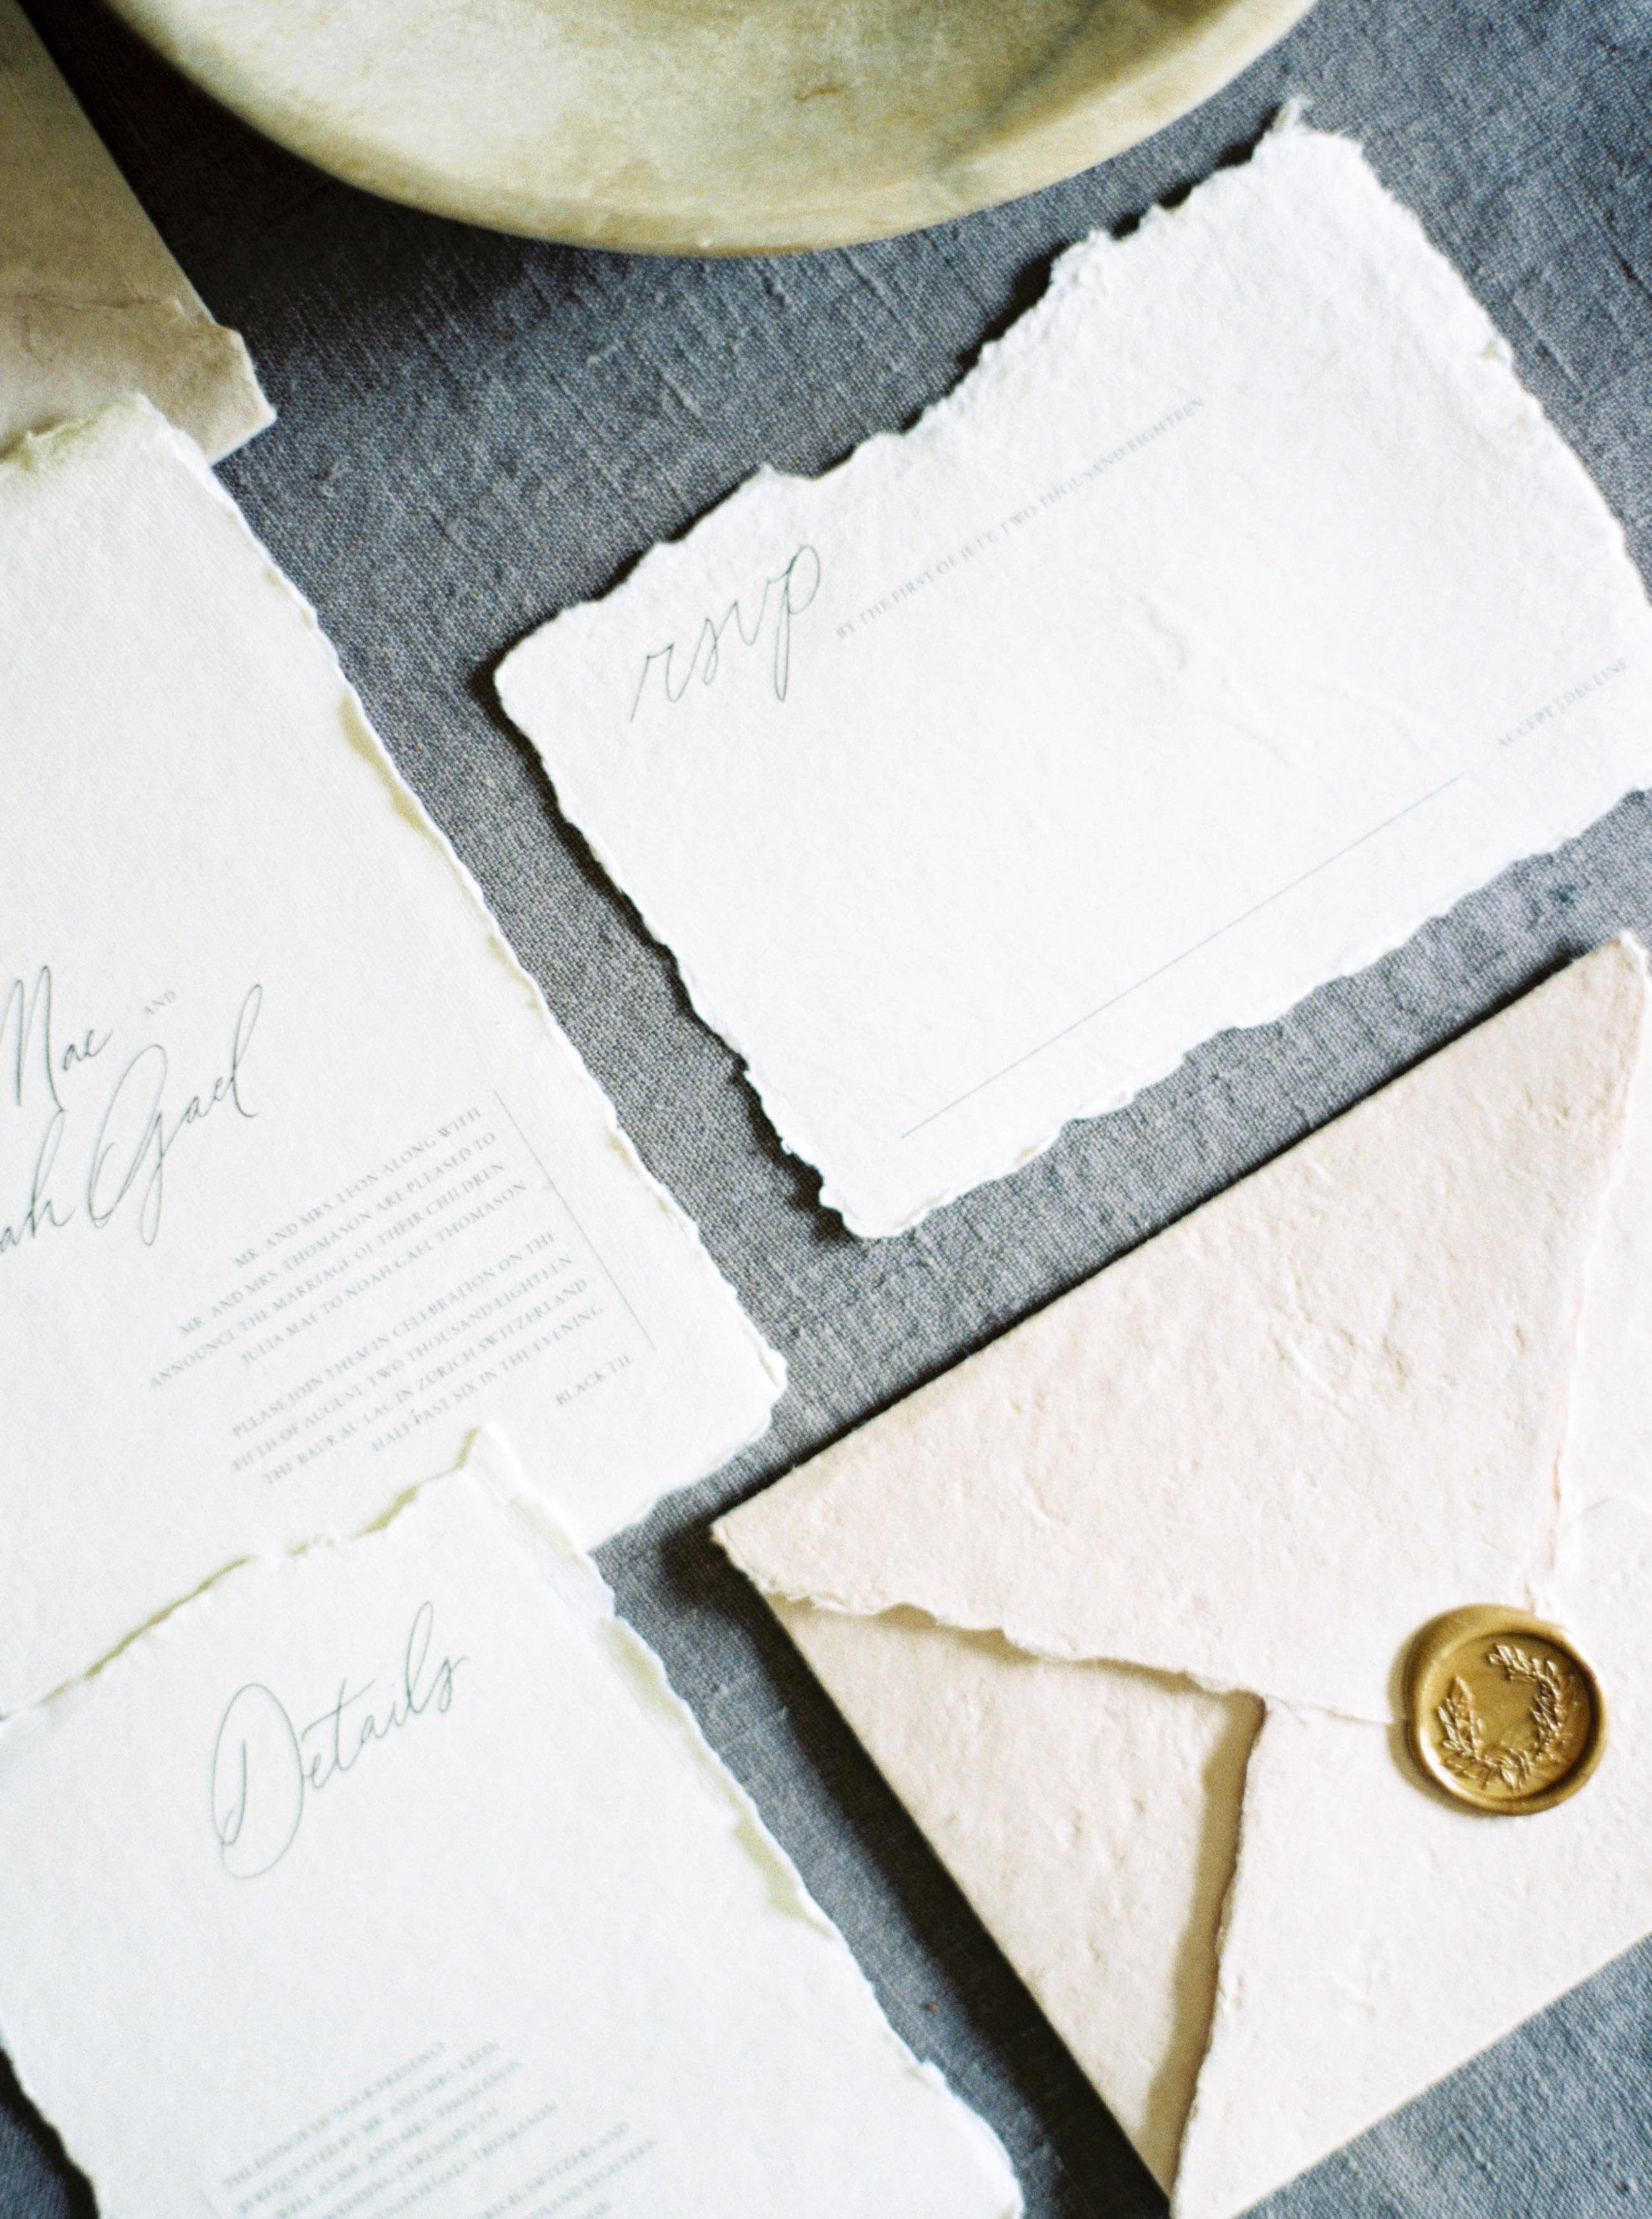 ink&pressco-mikylamanu-wedding-calligraphy-9-unearthing.tc.jpg